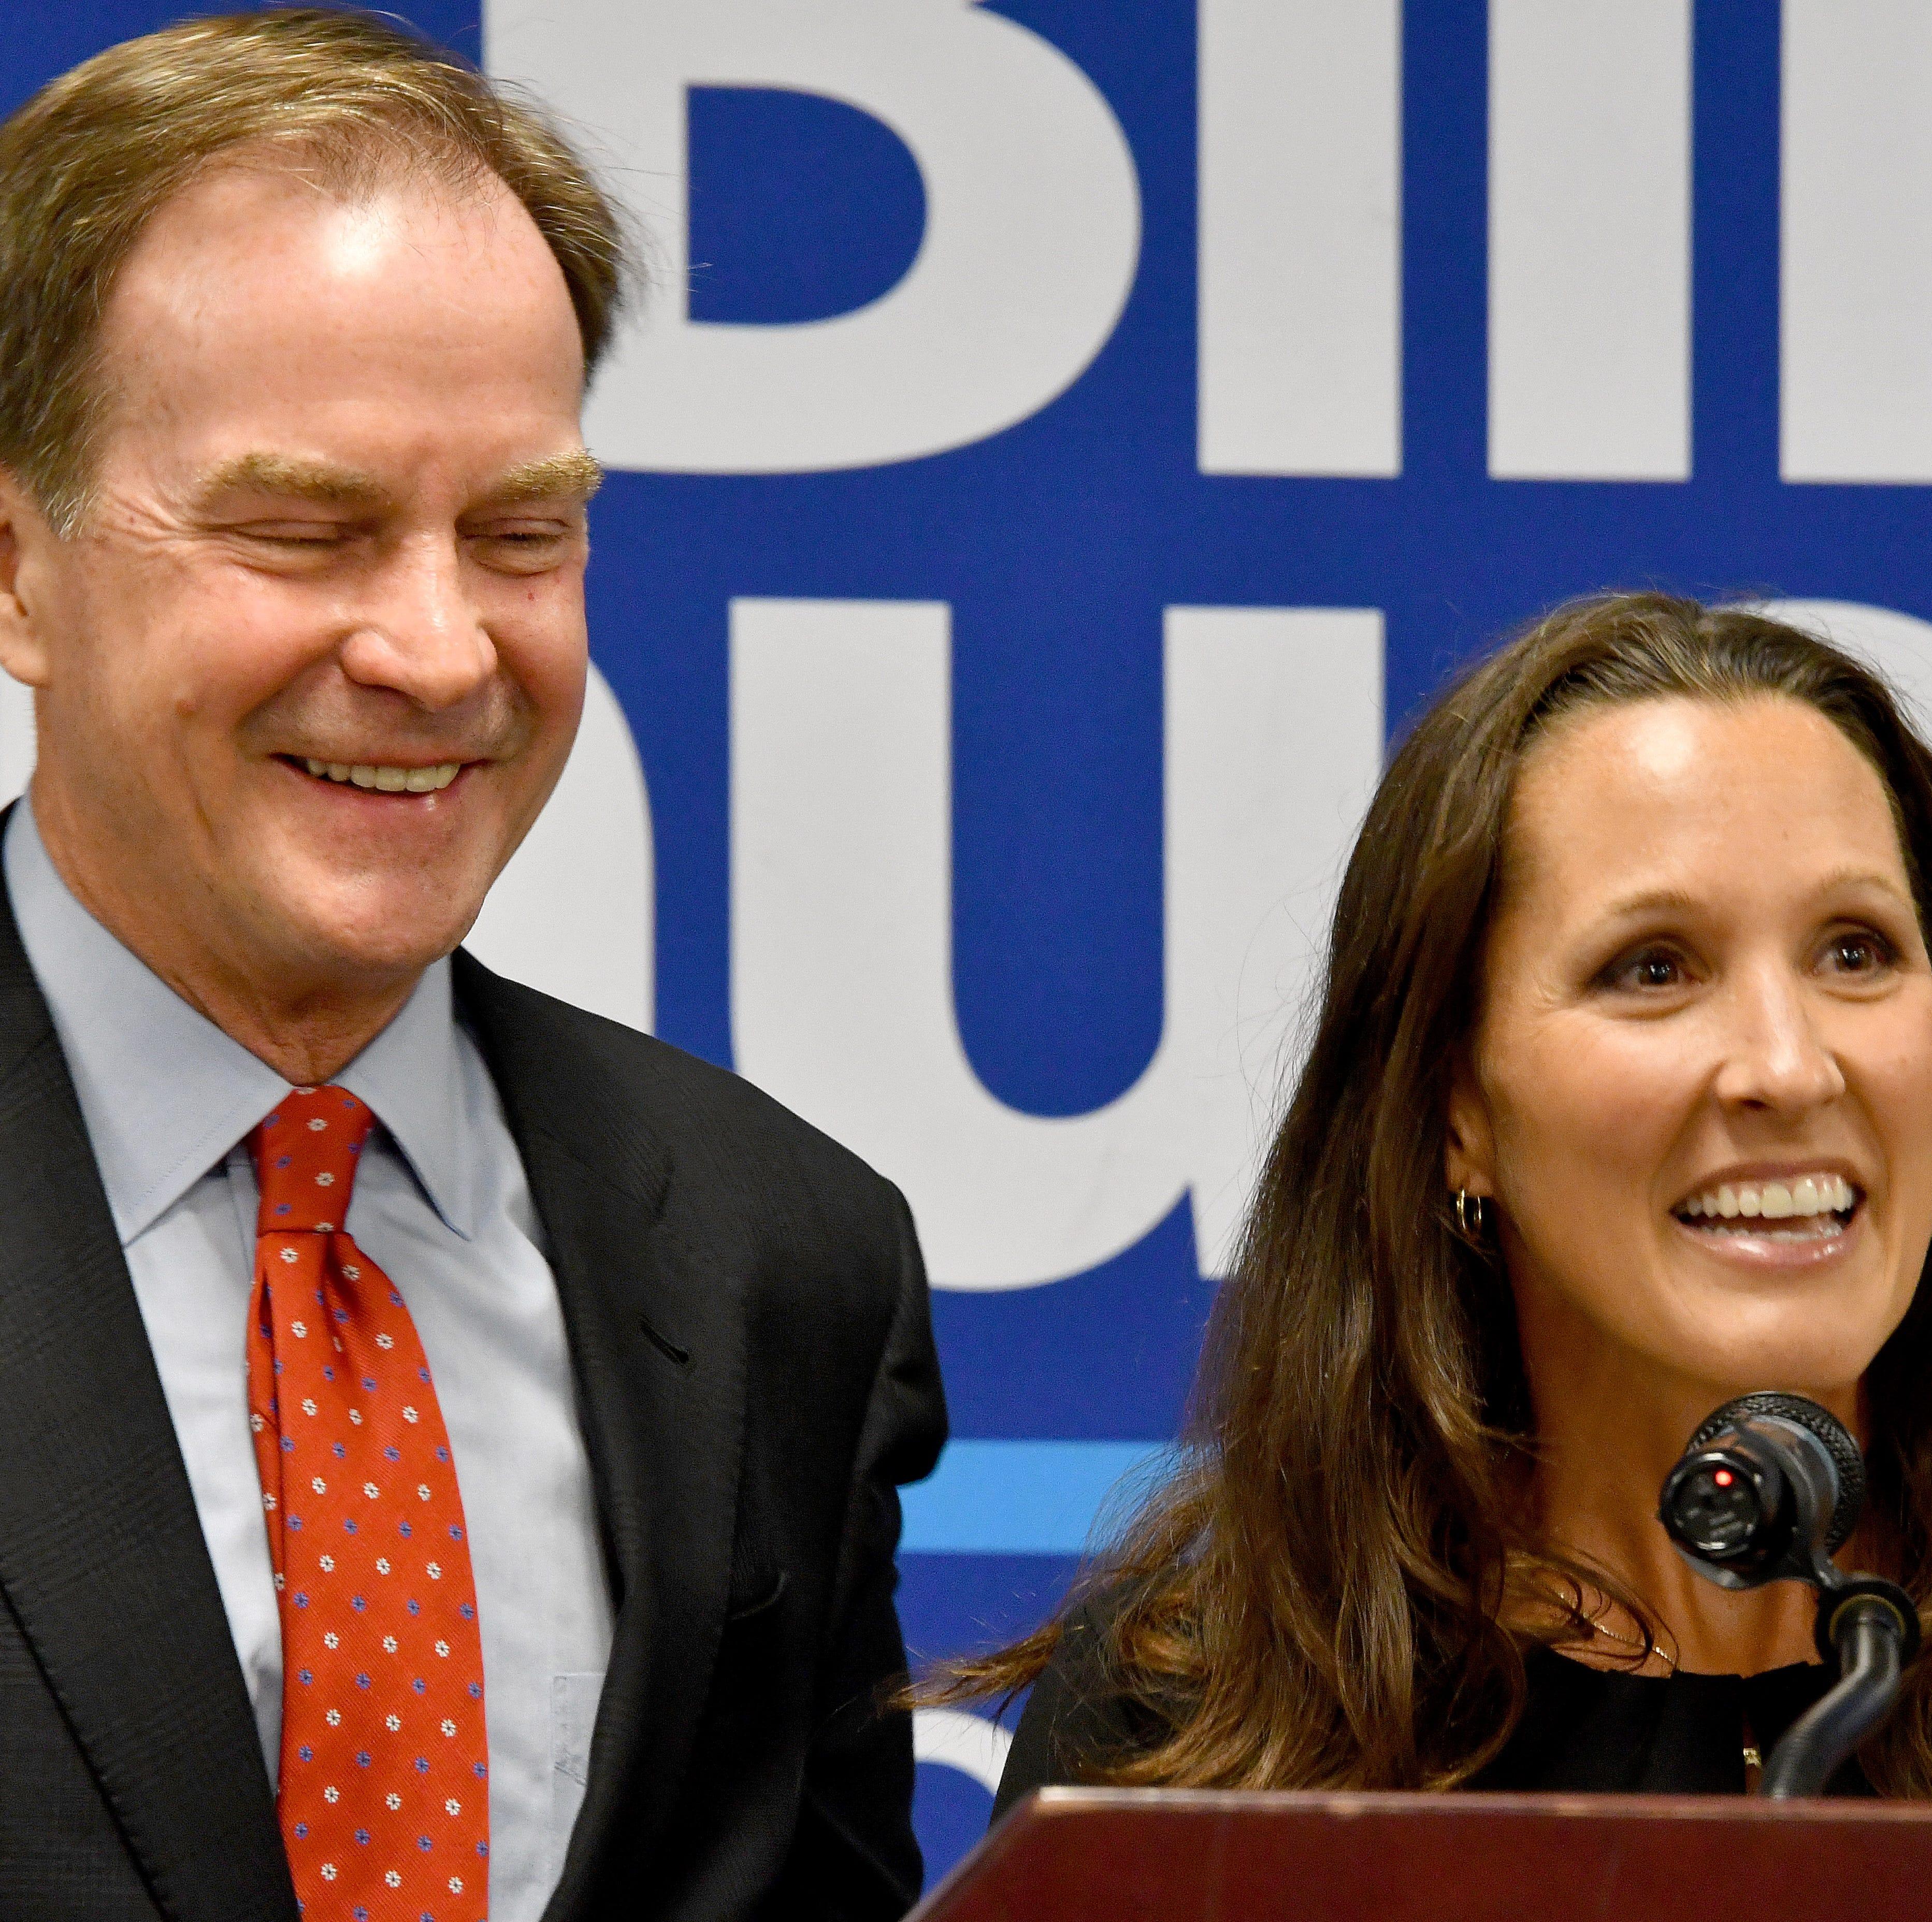 Bankole: Bill Schuette just made it tough for Democrats